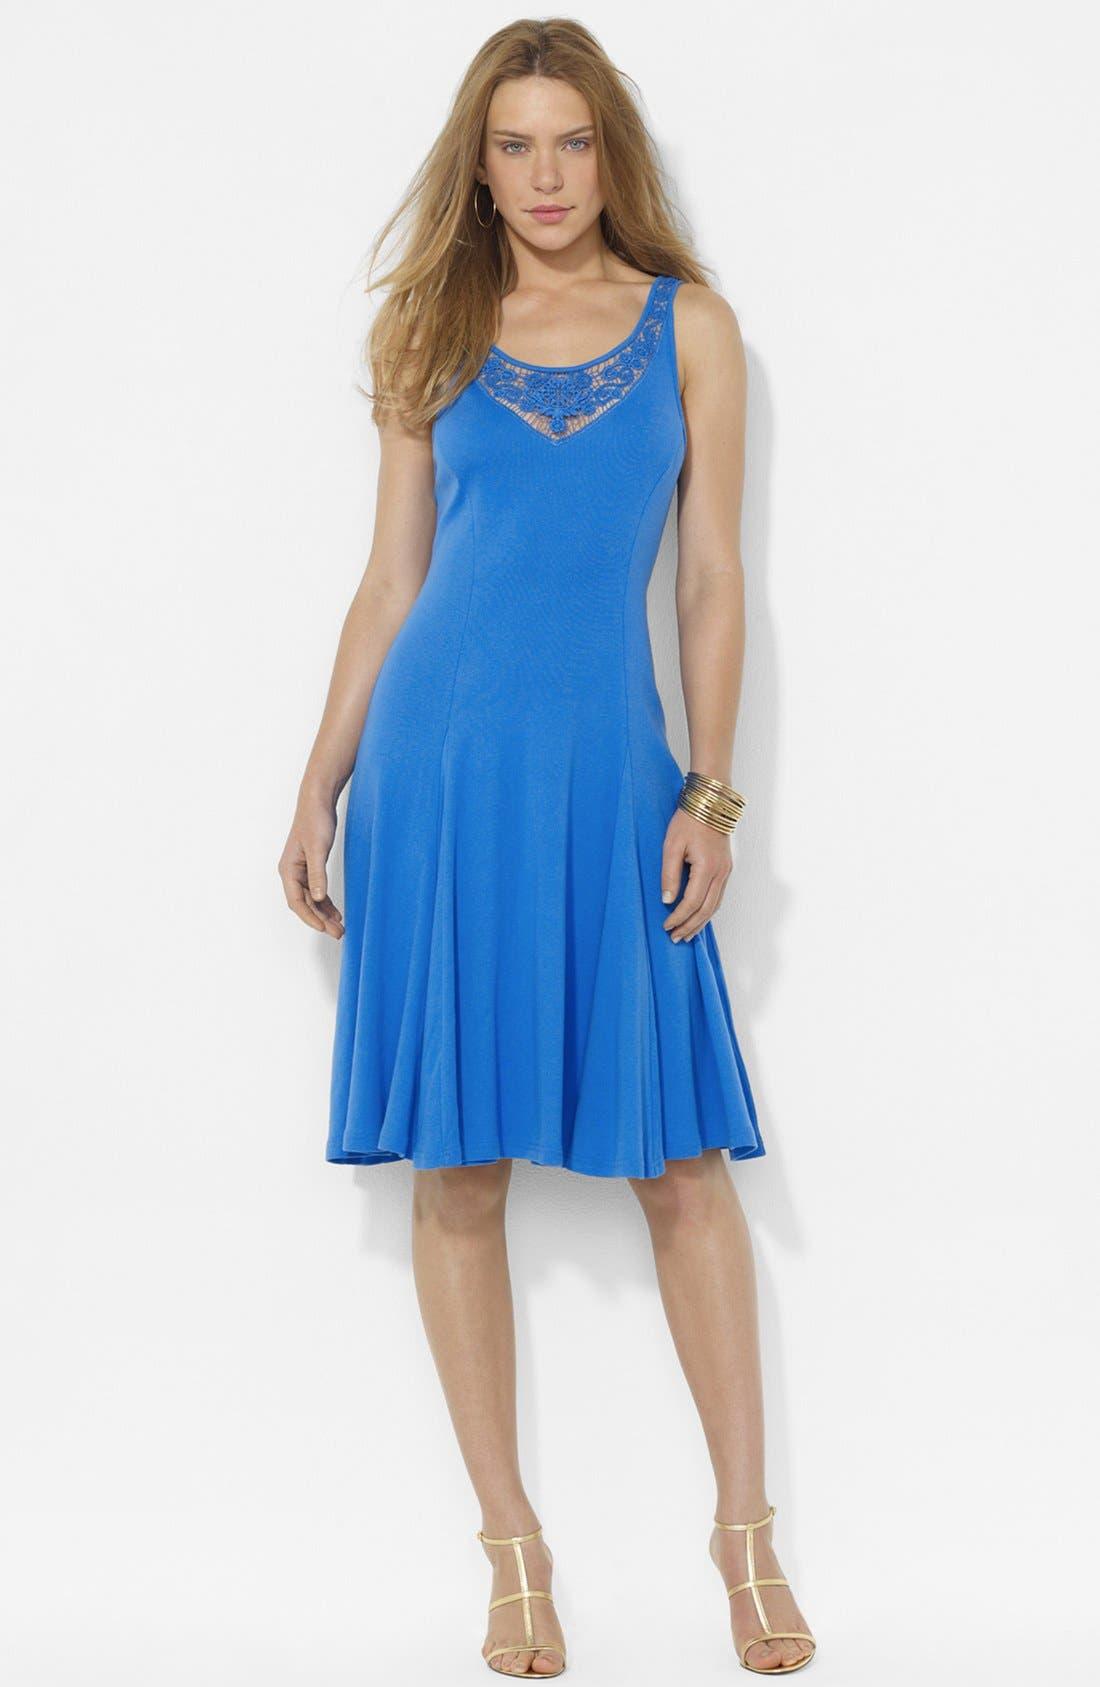 Alternate Image 1 Selected - Lauren Ralph Lauren Lace Inset Sleeveless Dress